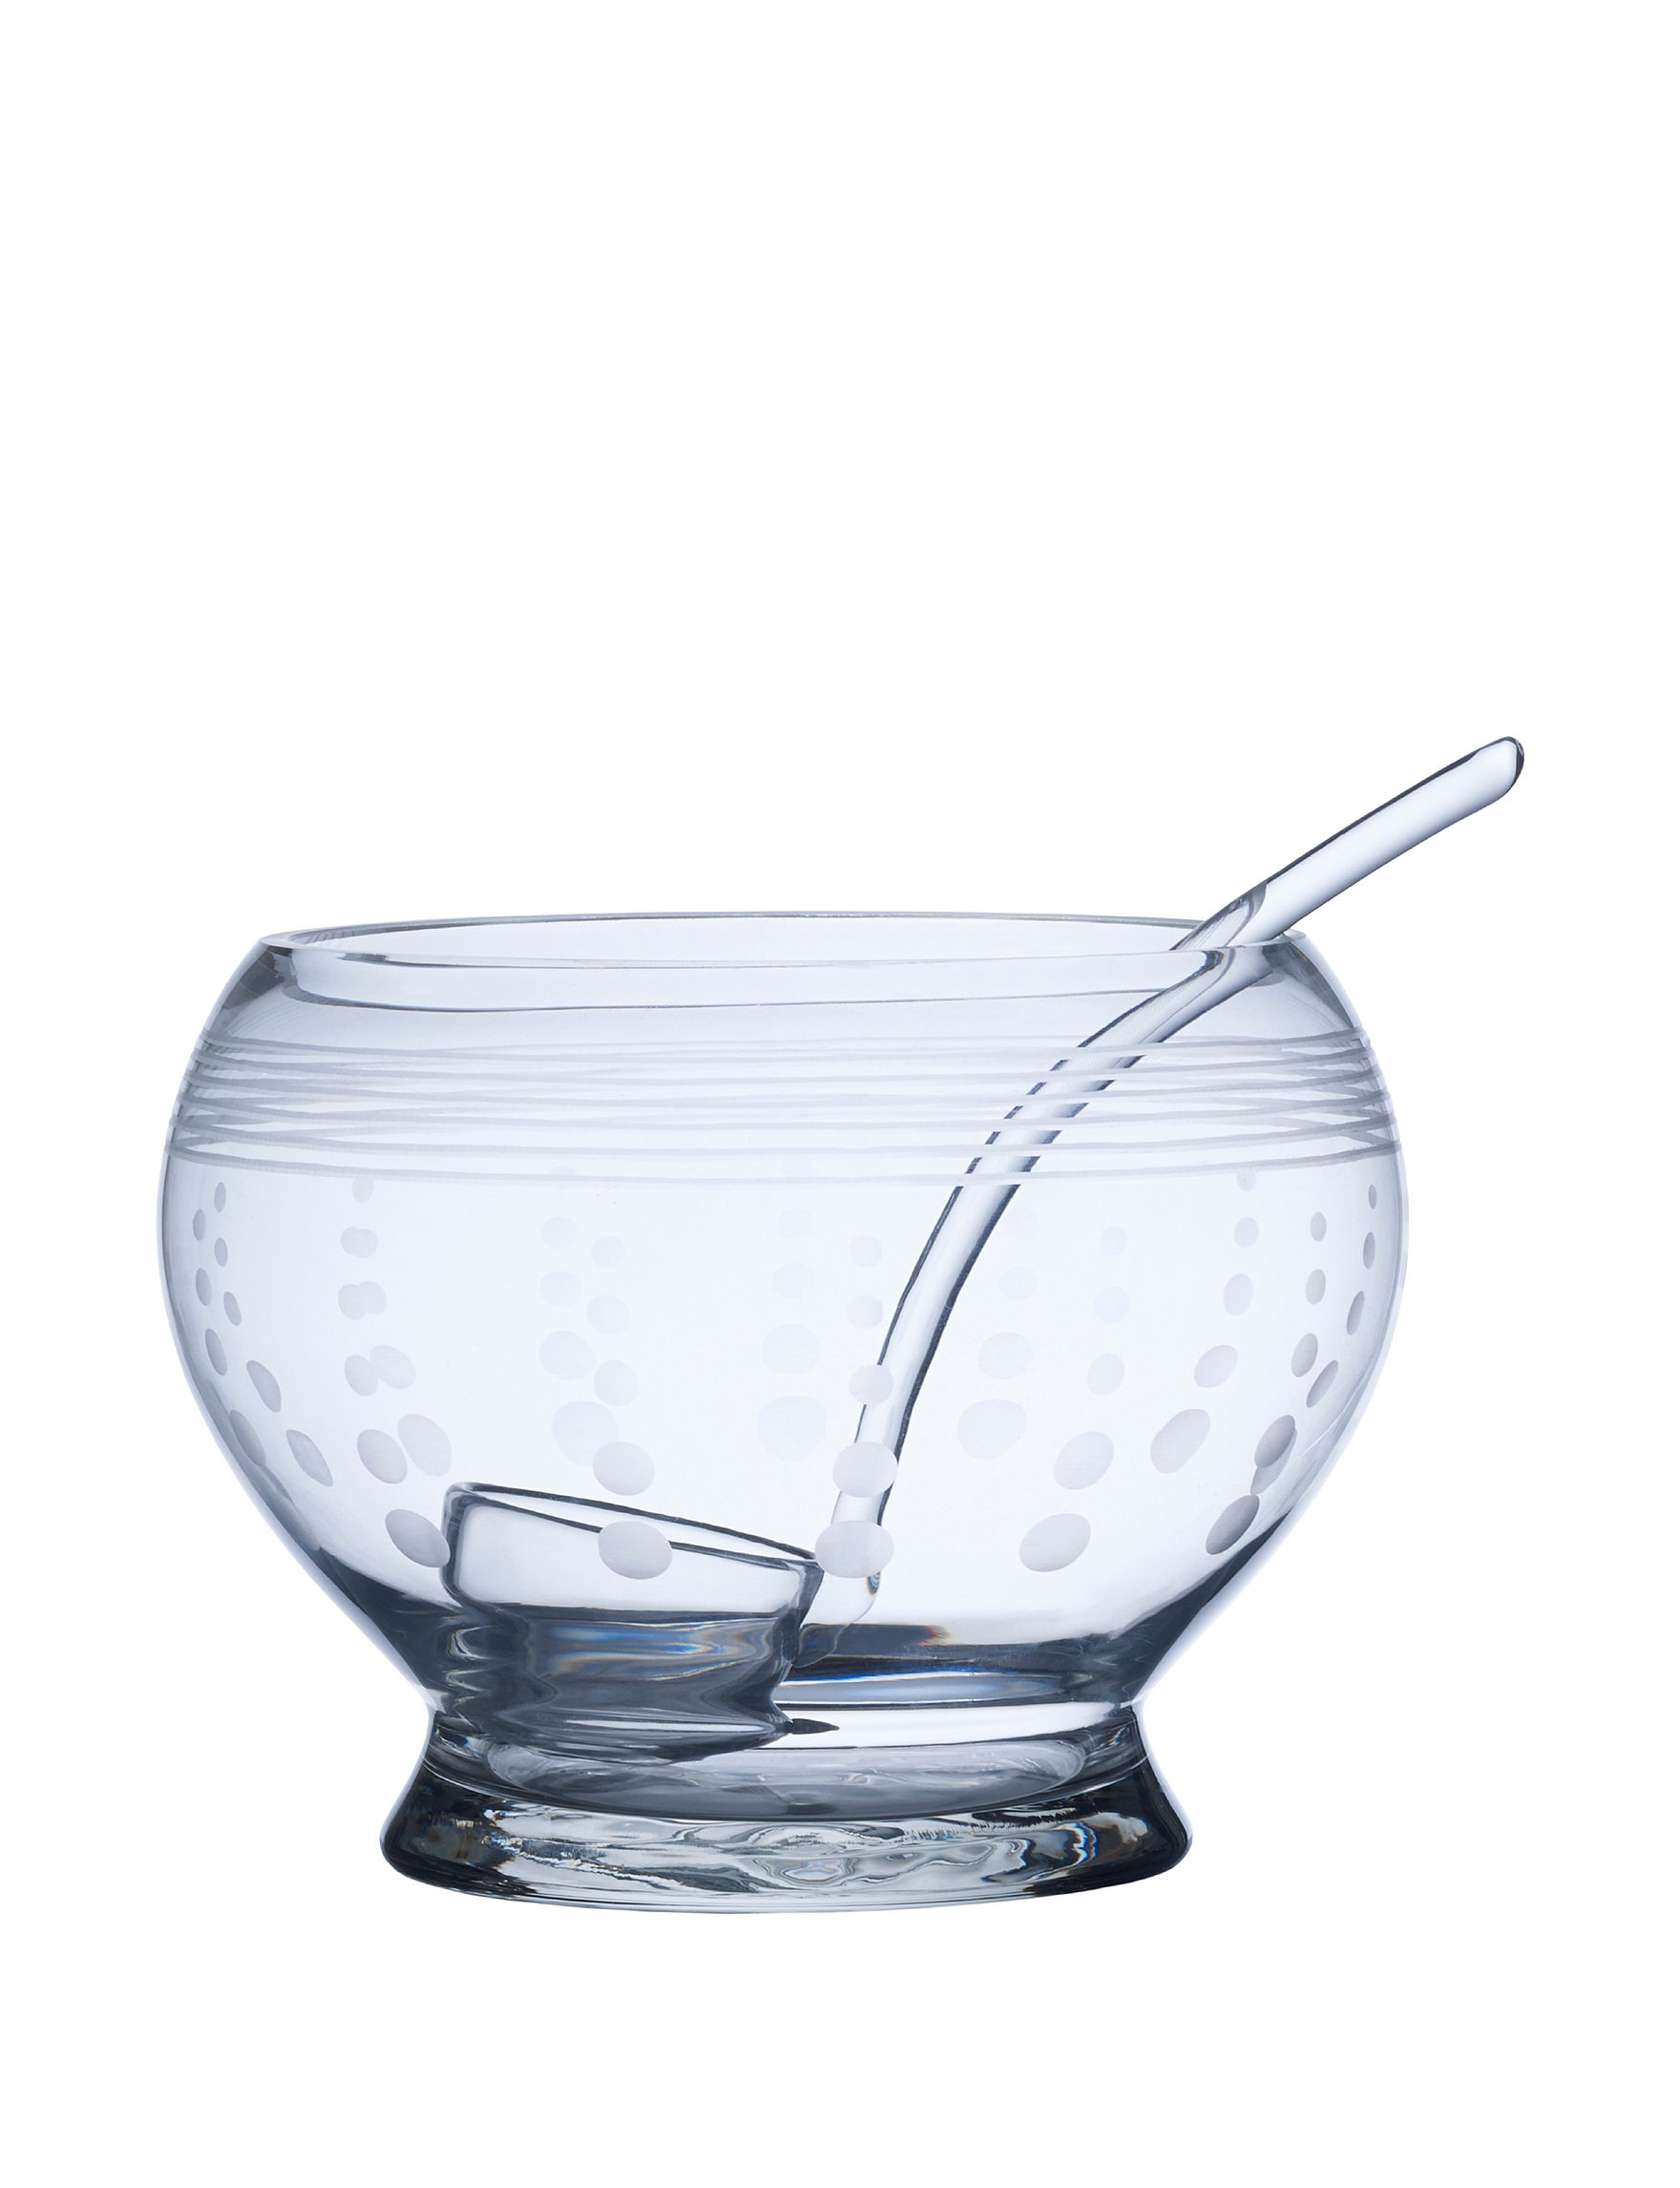 Mikasa Clear Drinkware